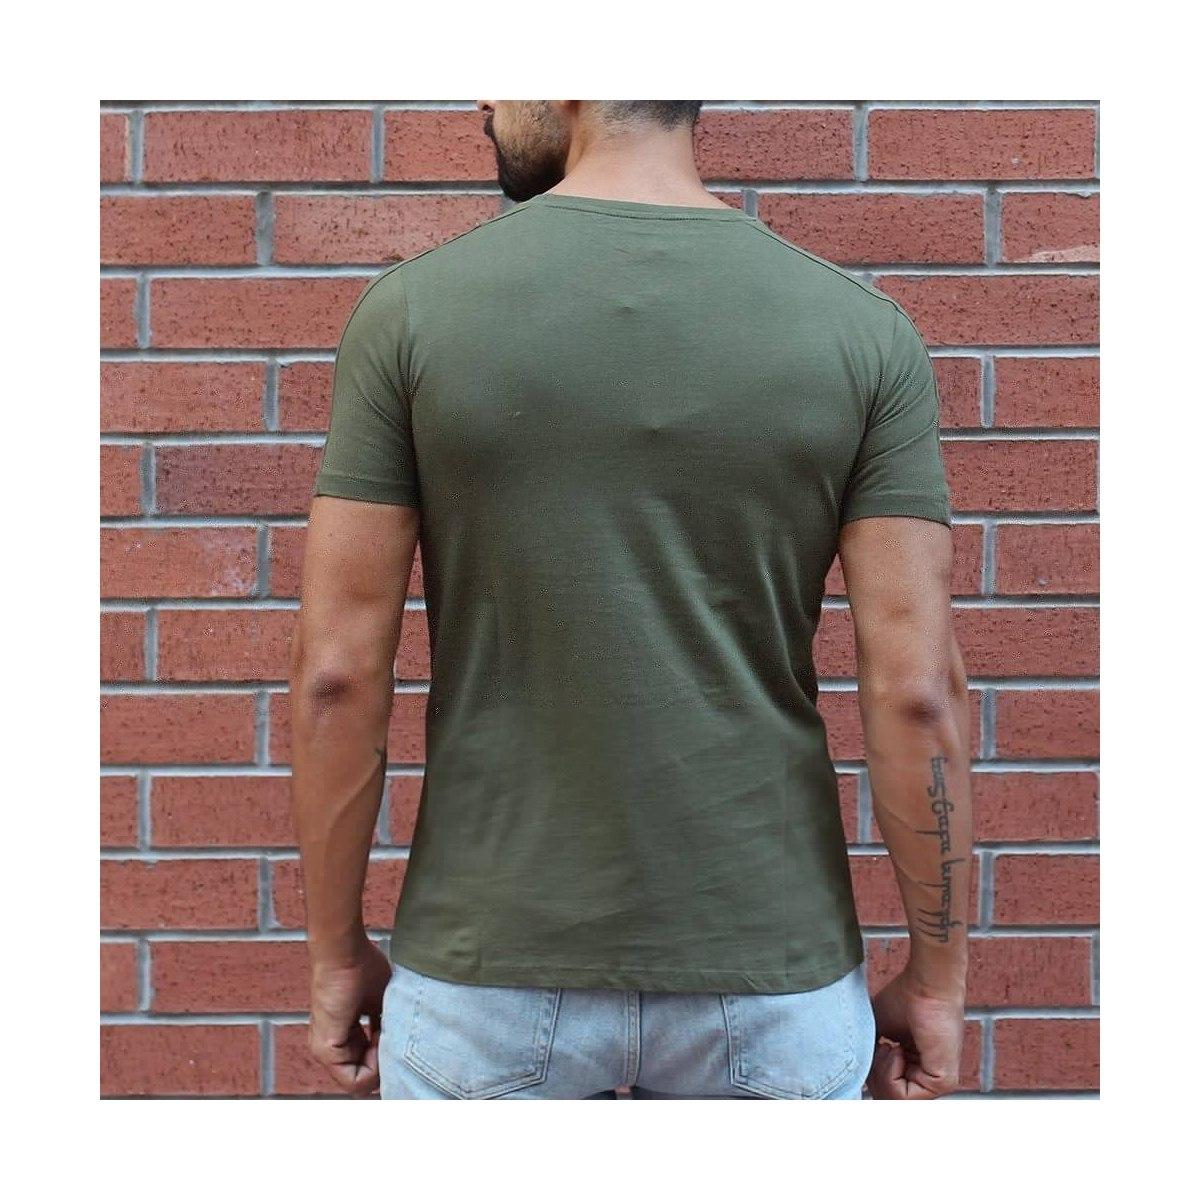 Men's Round Neck Stylish Basic T-Shirt Khaki MV T-shirt Collection - 1